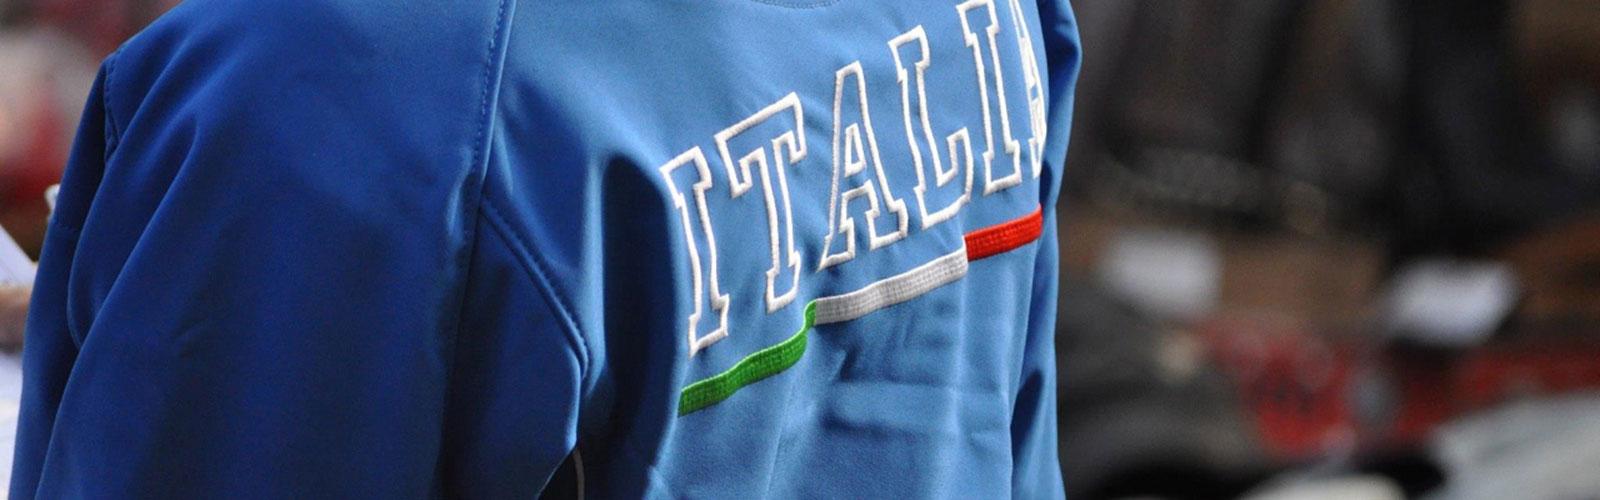 felpa-italia1600x500